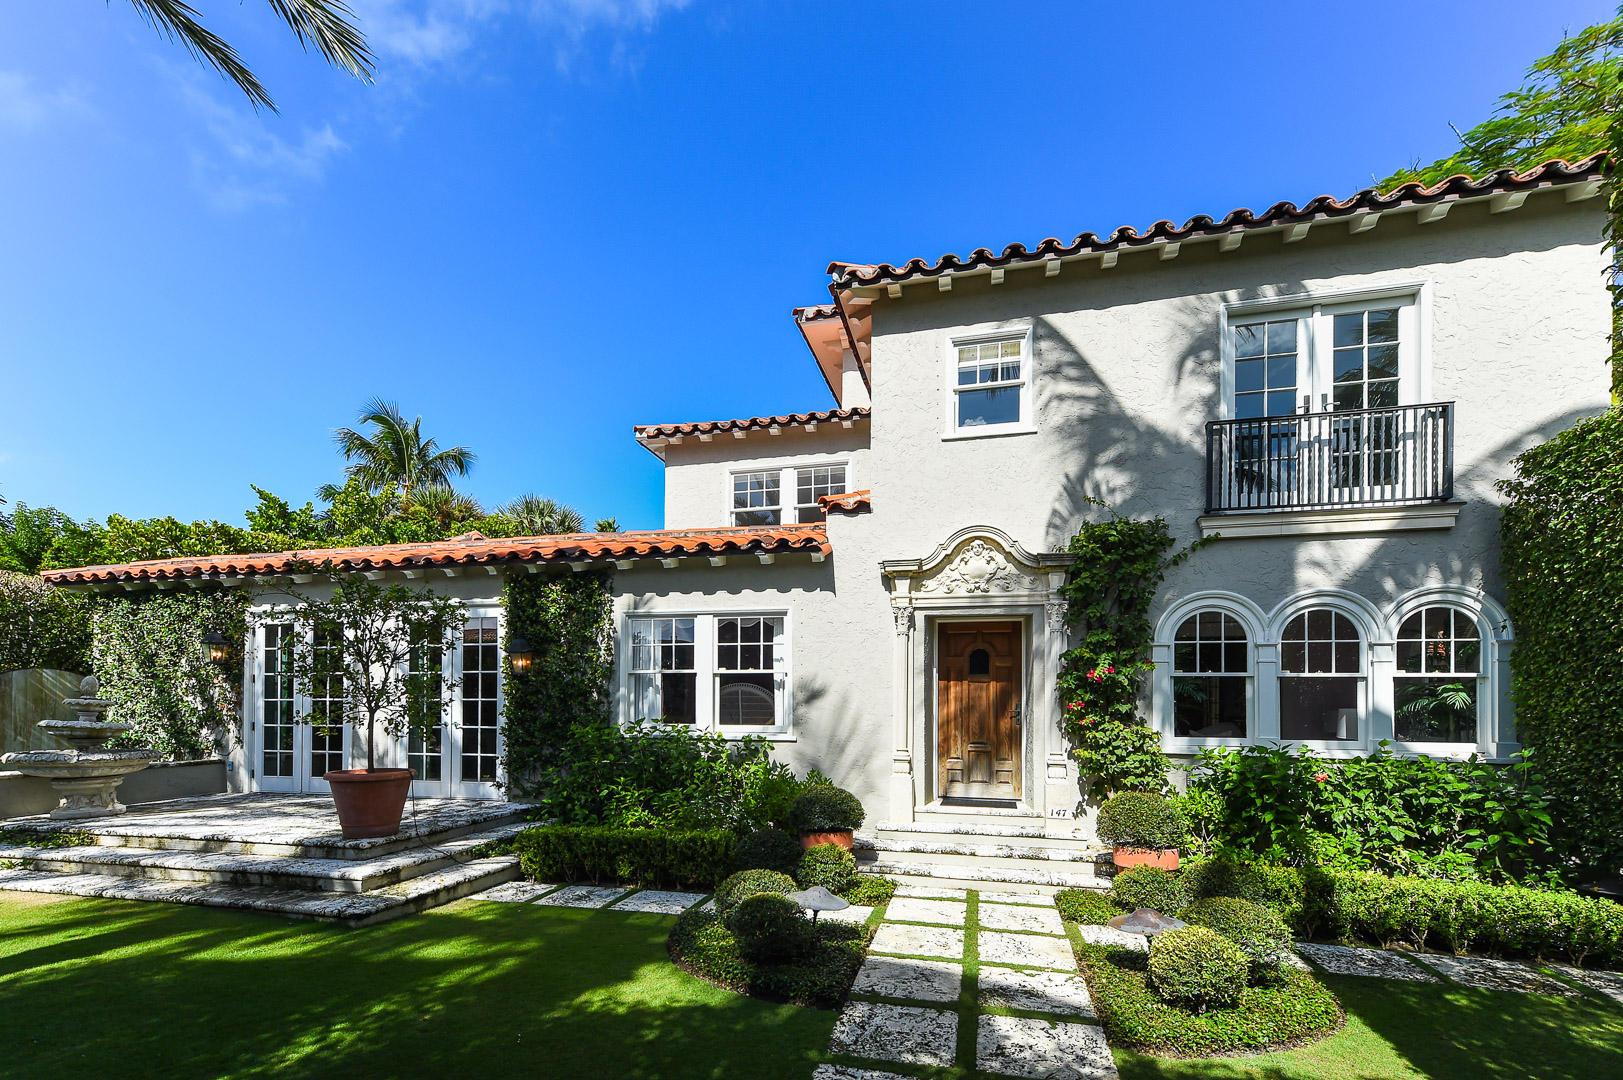 147 Seabreeze Avenue, Palm Beach, Florida 33480, 4 Bedrooms Bedrooms, ,4.1 BathroomsBathrooms,Single Family,For Sale,Seabreeze,RX-10482334